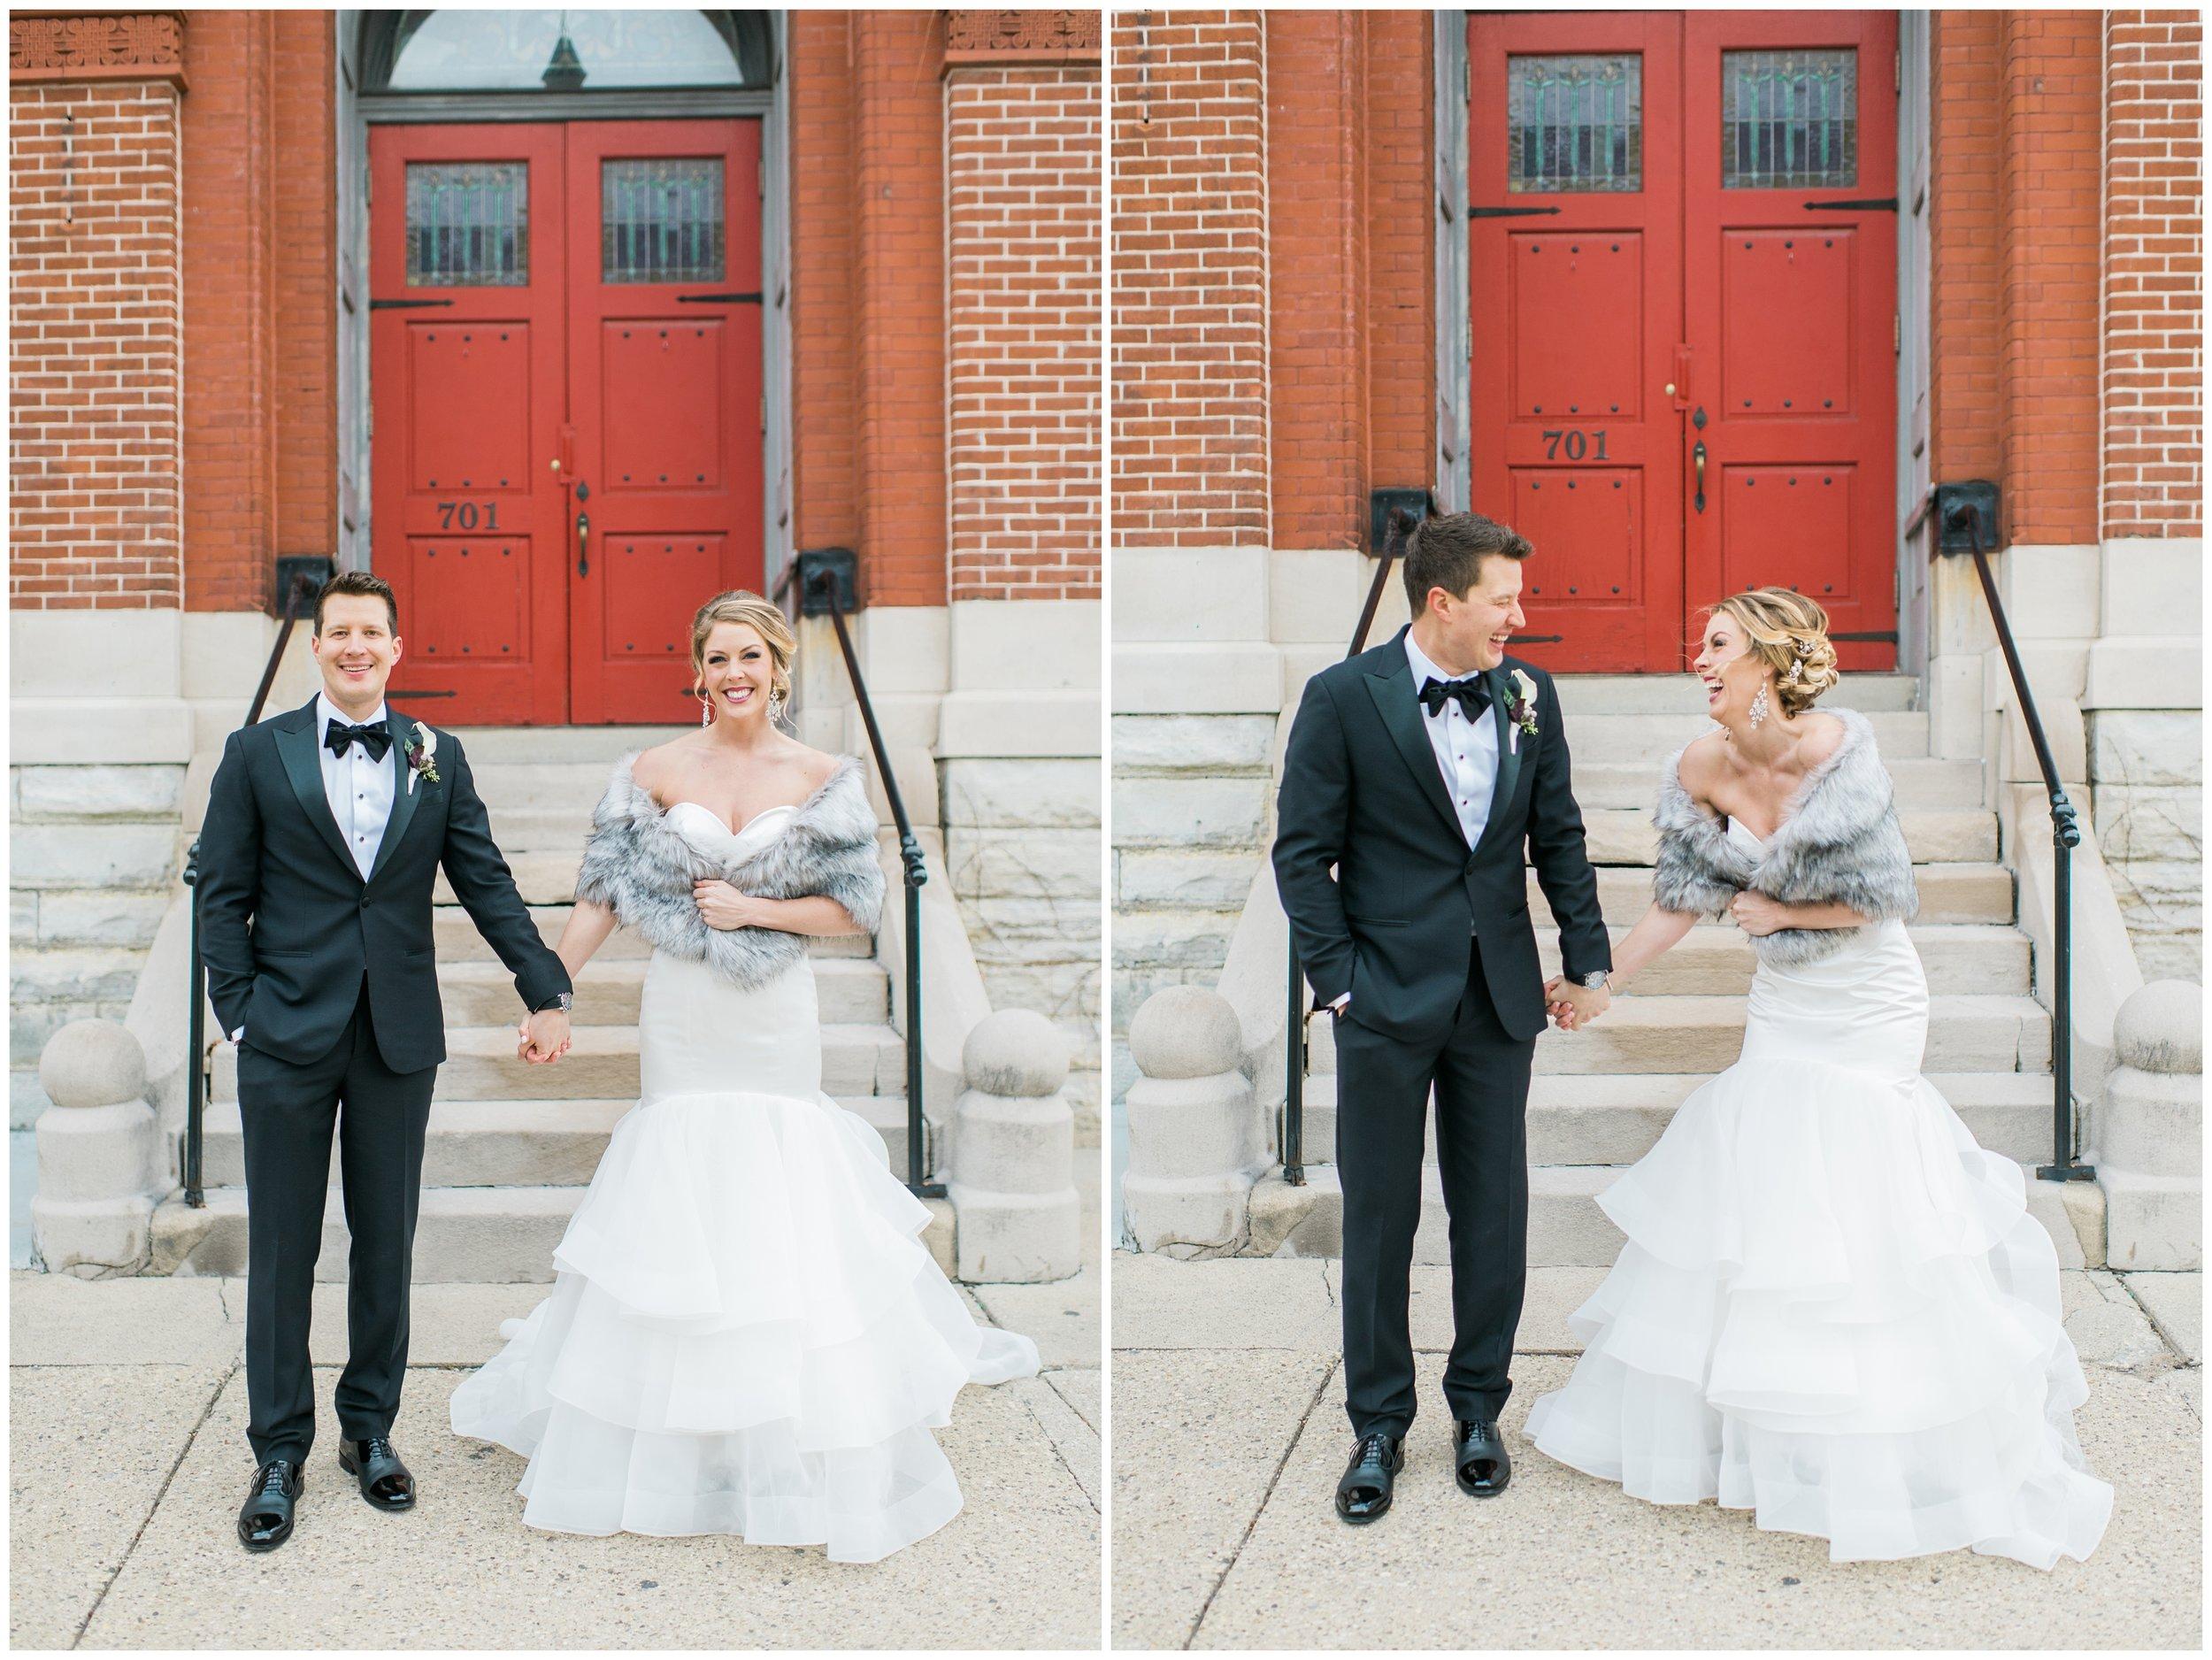 Rebecca_Bridges_Photography_Indianapolis_Wedding_Photographer_5807.jpg